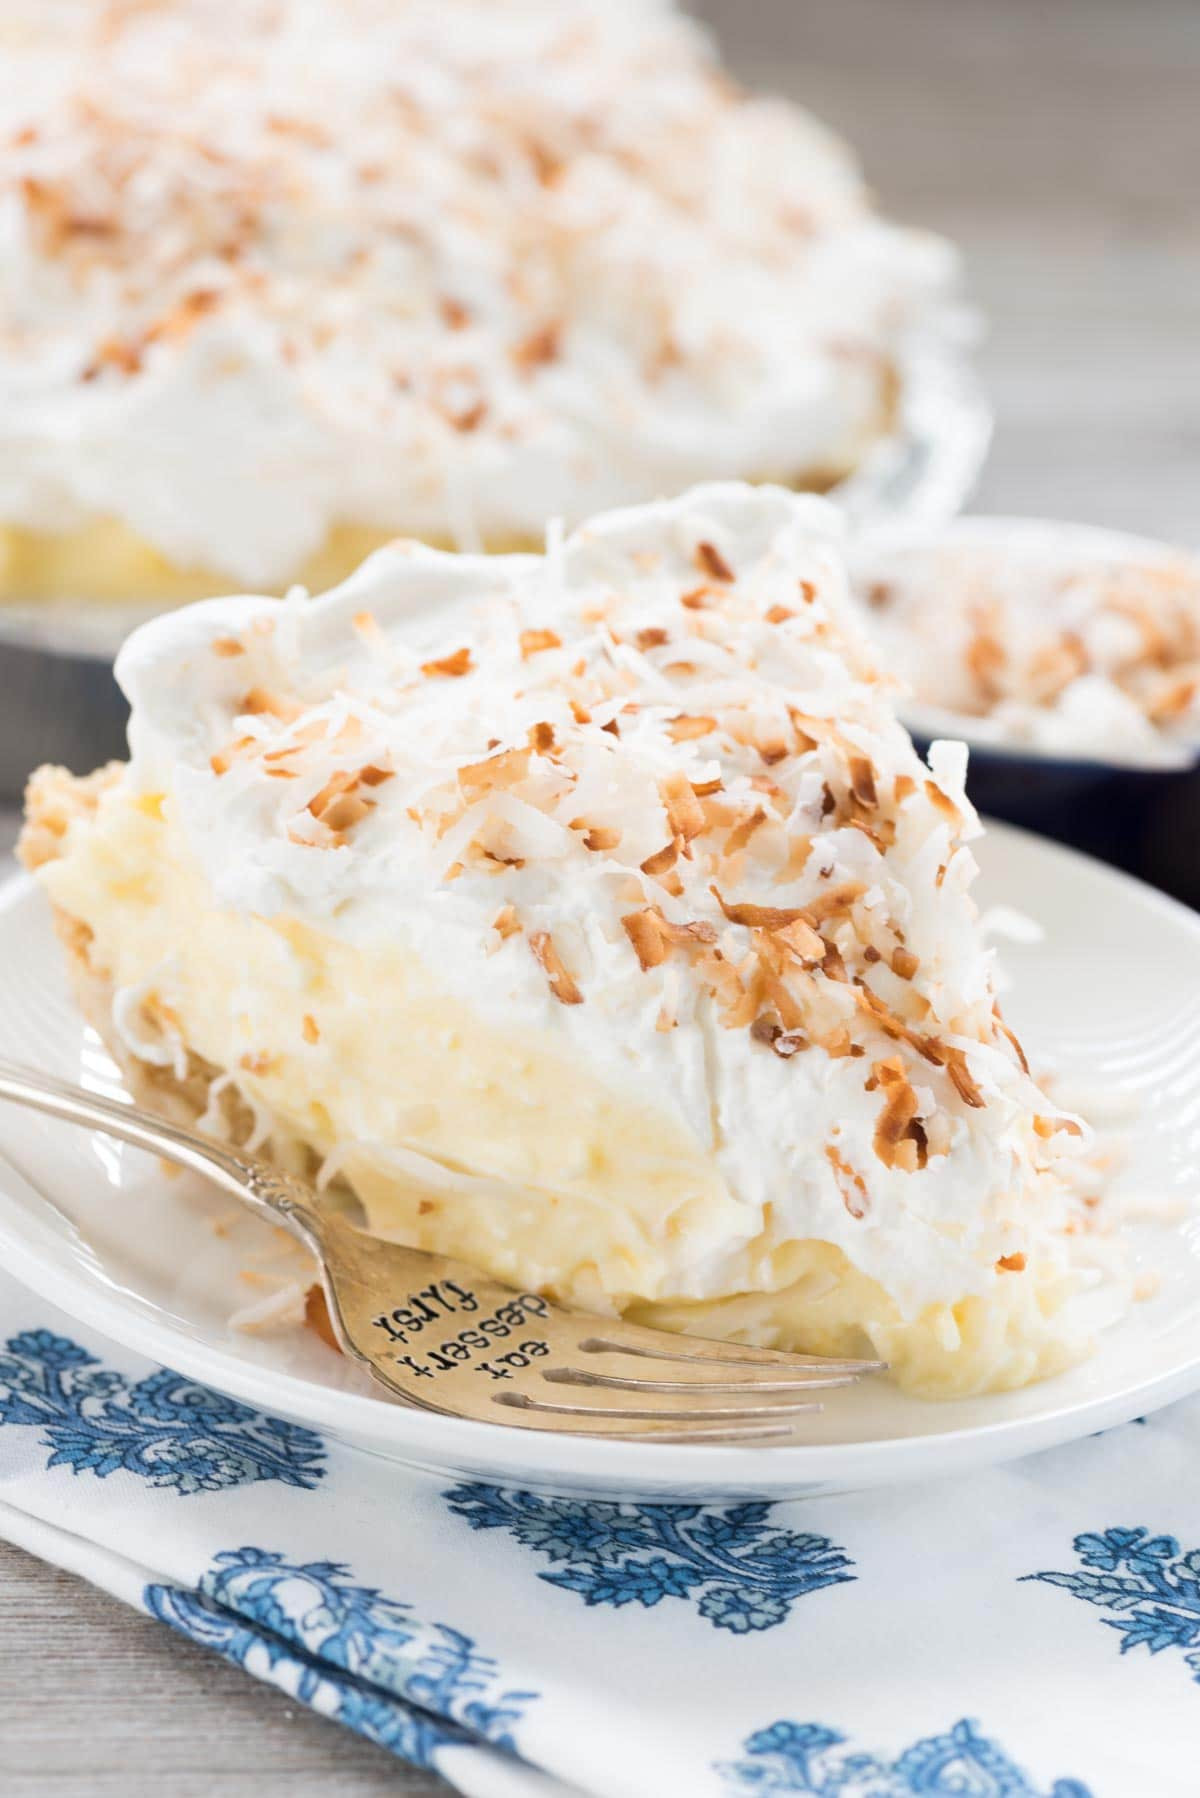 Coconut Cream Pie With Pudding  Easy No Bake Coconut Cream Pie Crazy For Crust